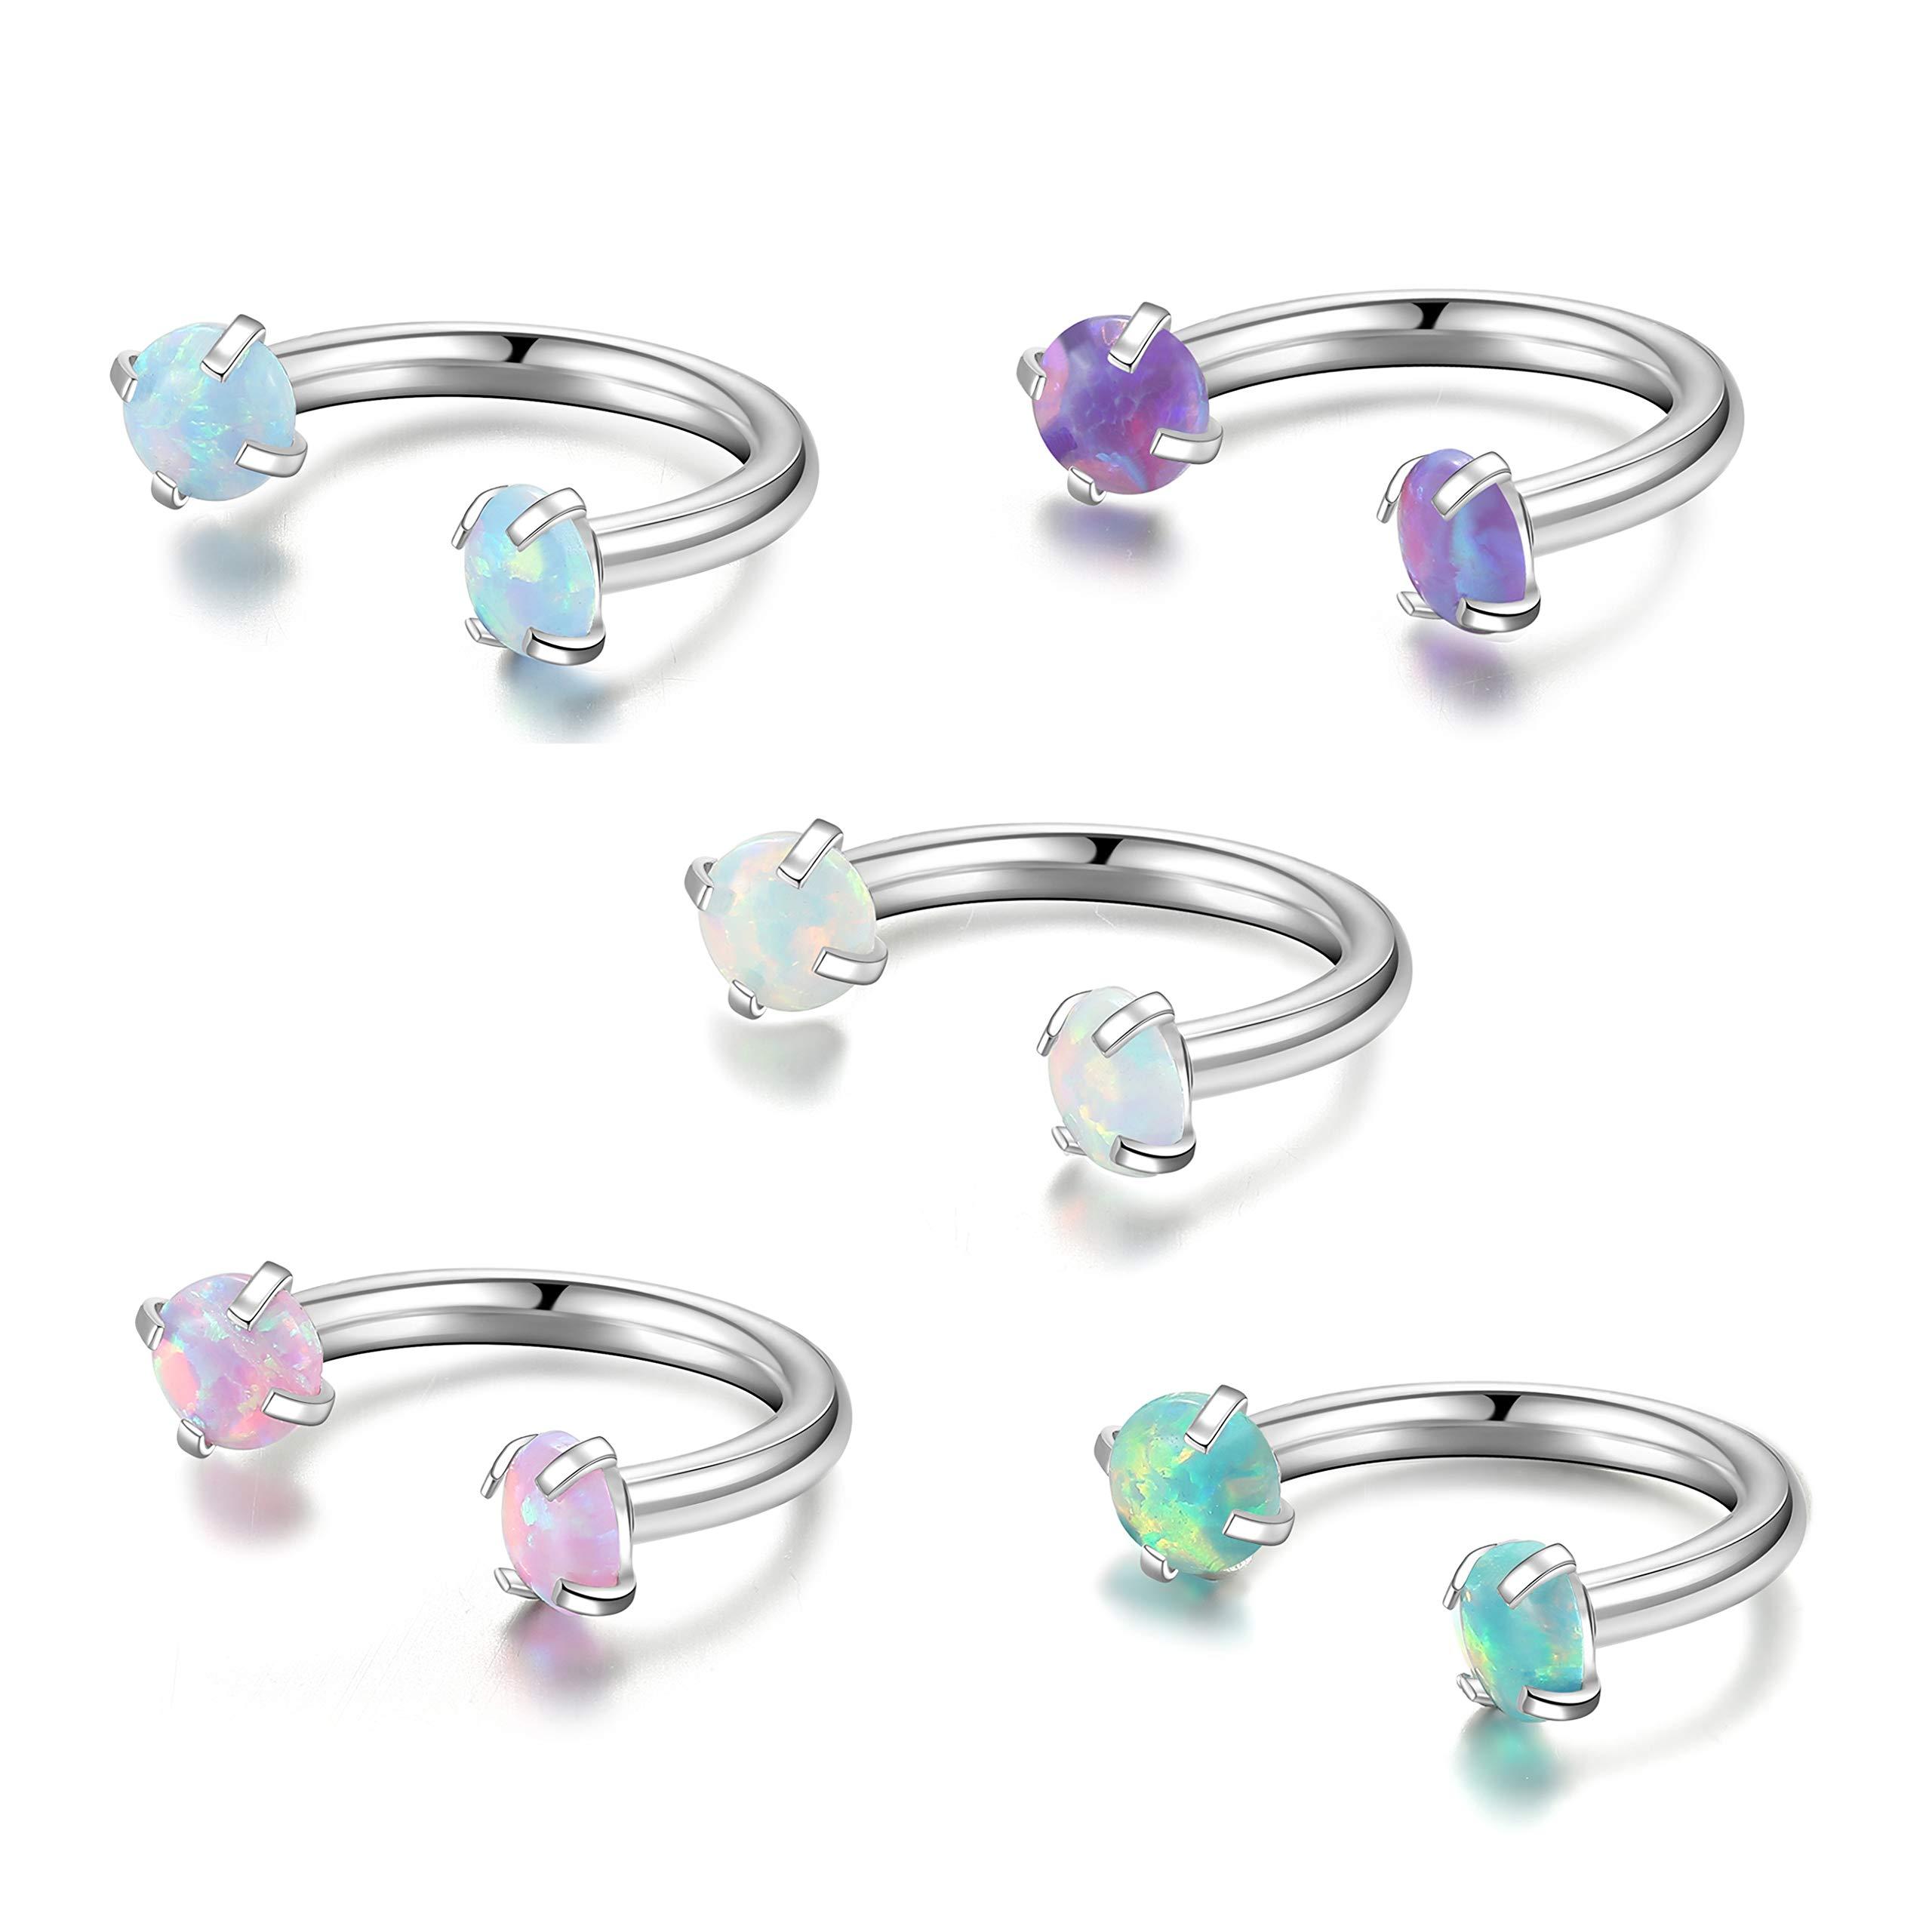 Opal Horseshoe Ring Stainless Steel 8mm 16g Ear Daith Cartilage Horseshoe Earring Piercing Jewelry for Women